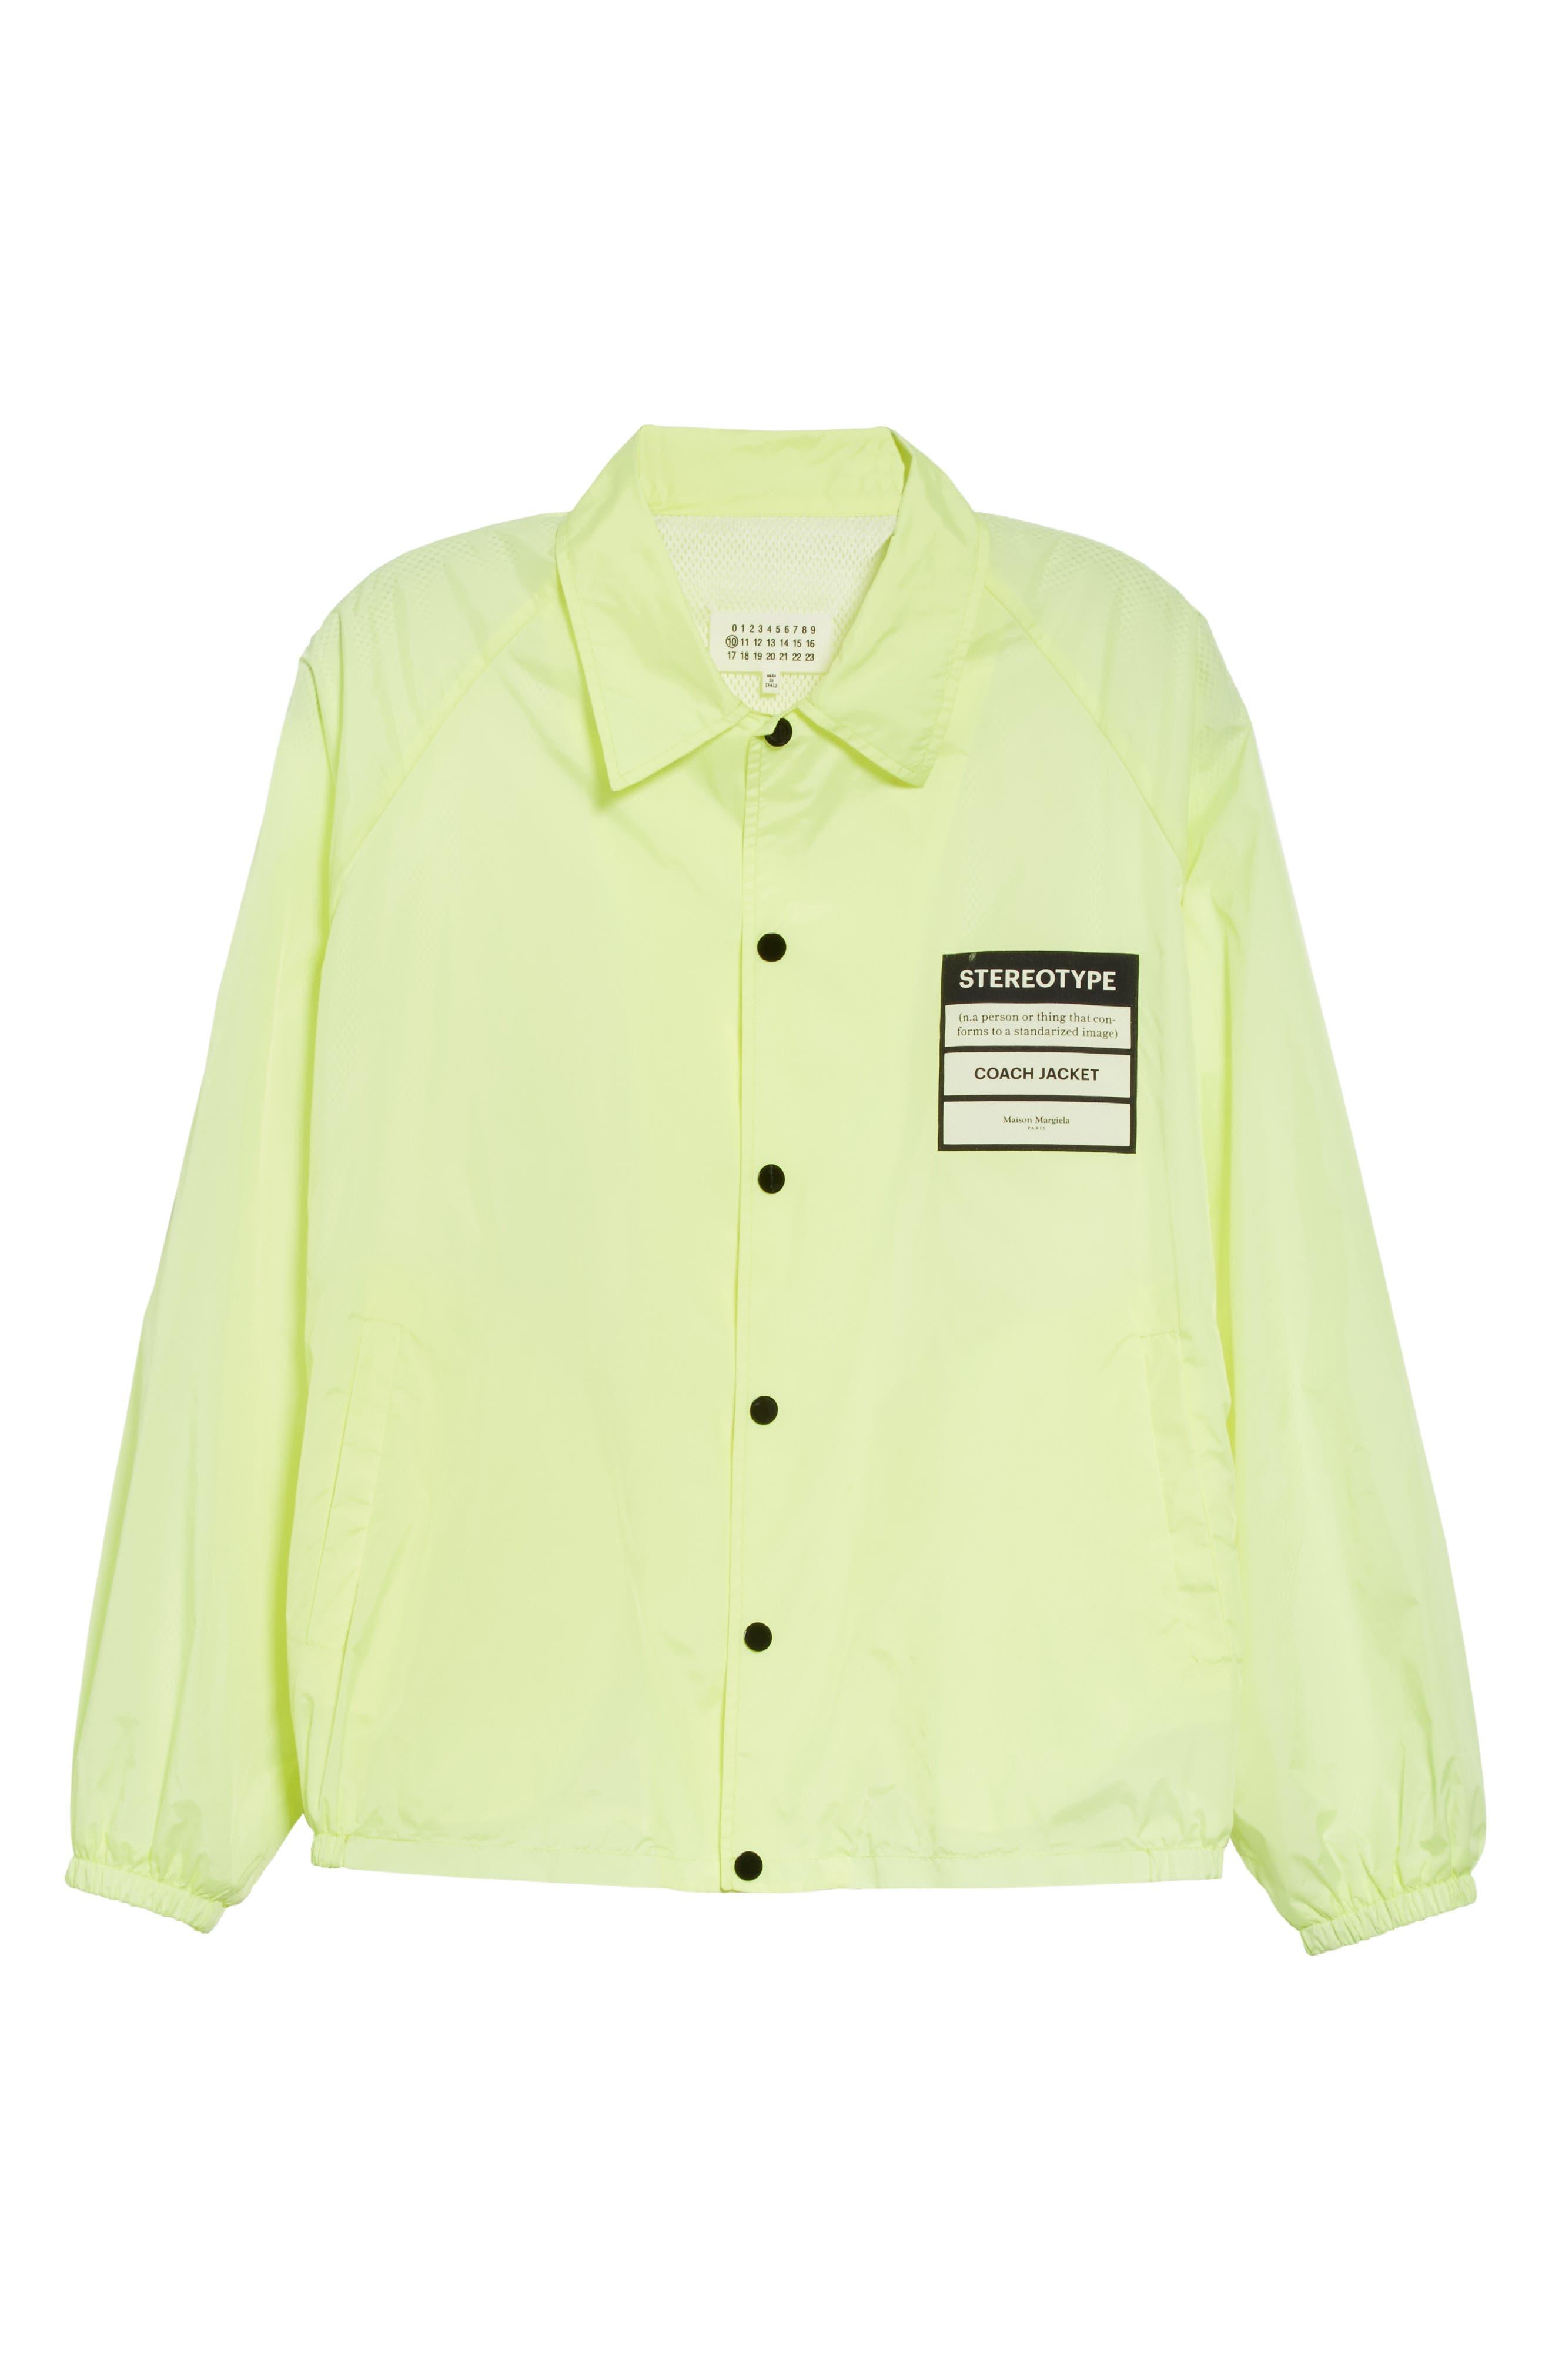 MAISON MARGIELA, Stereotype Coach's Jacket, Alternate thumbnail 5, color, NEON YELLOW